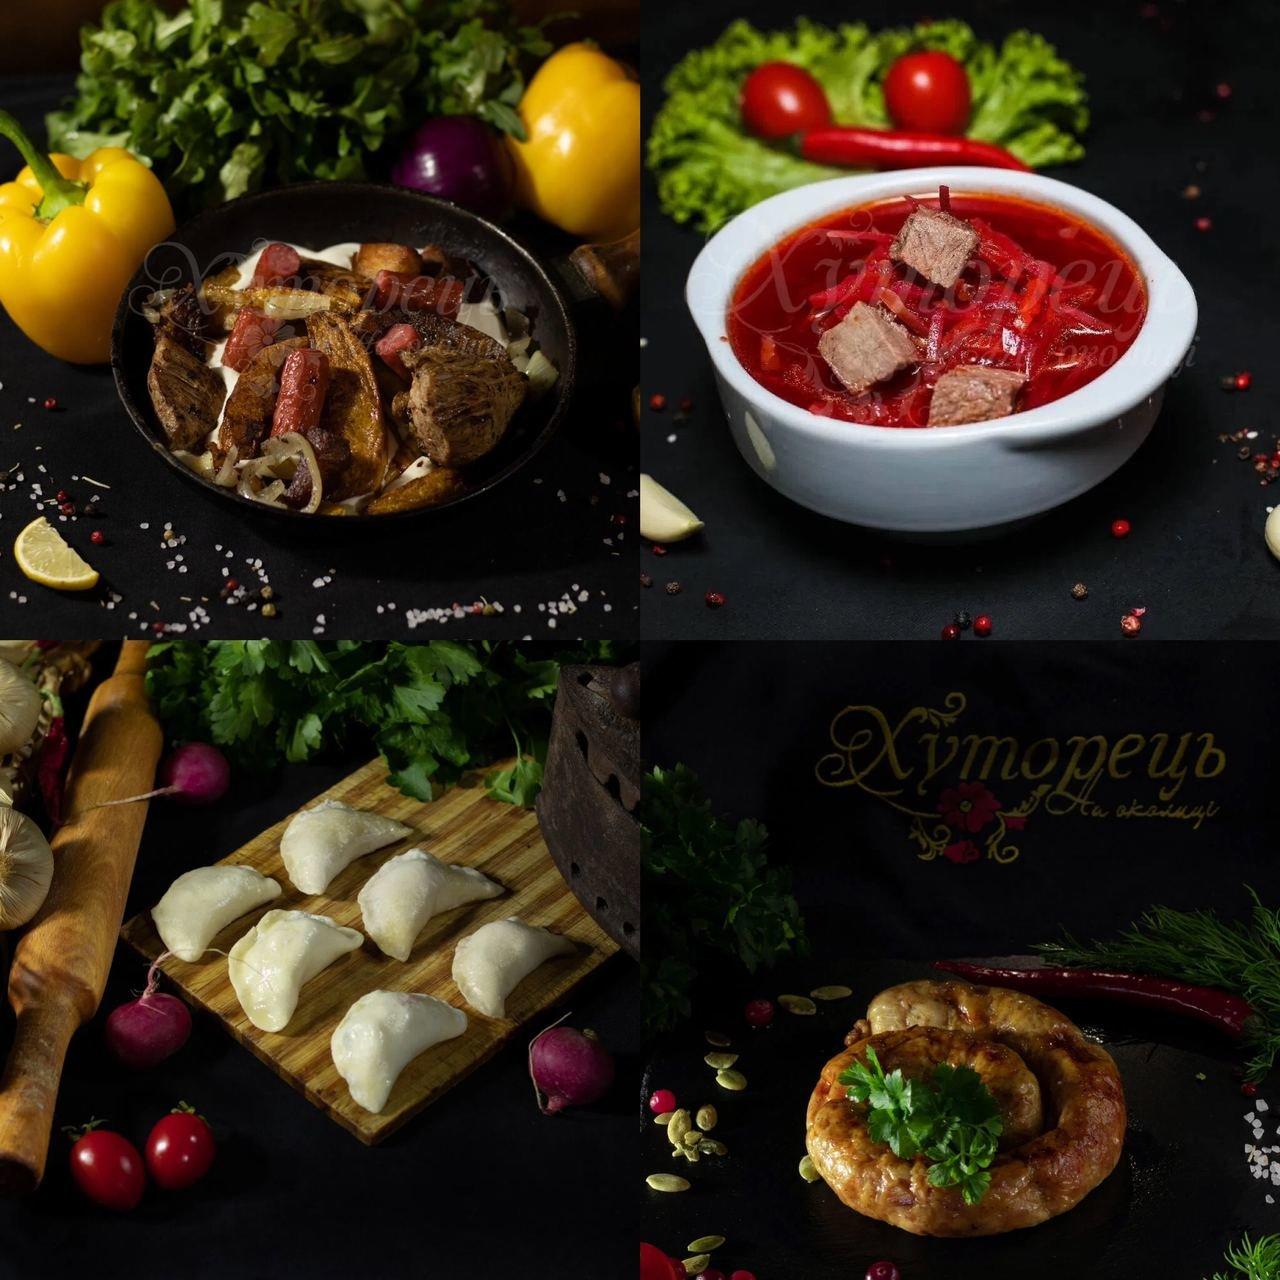 Доставка еды от ресторана «Хуторець на околице», фото-3